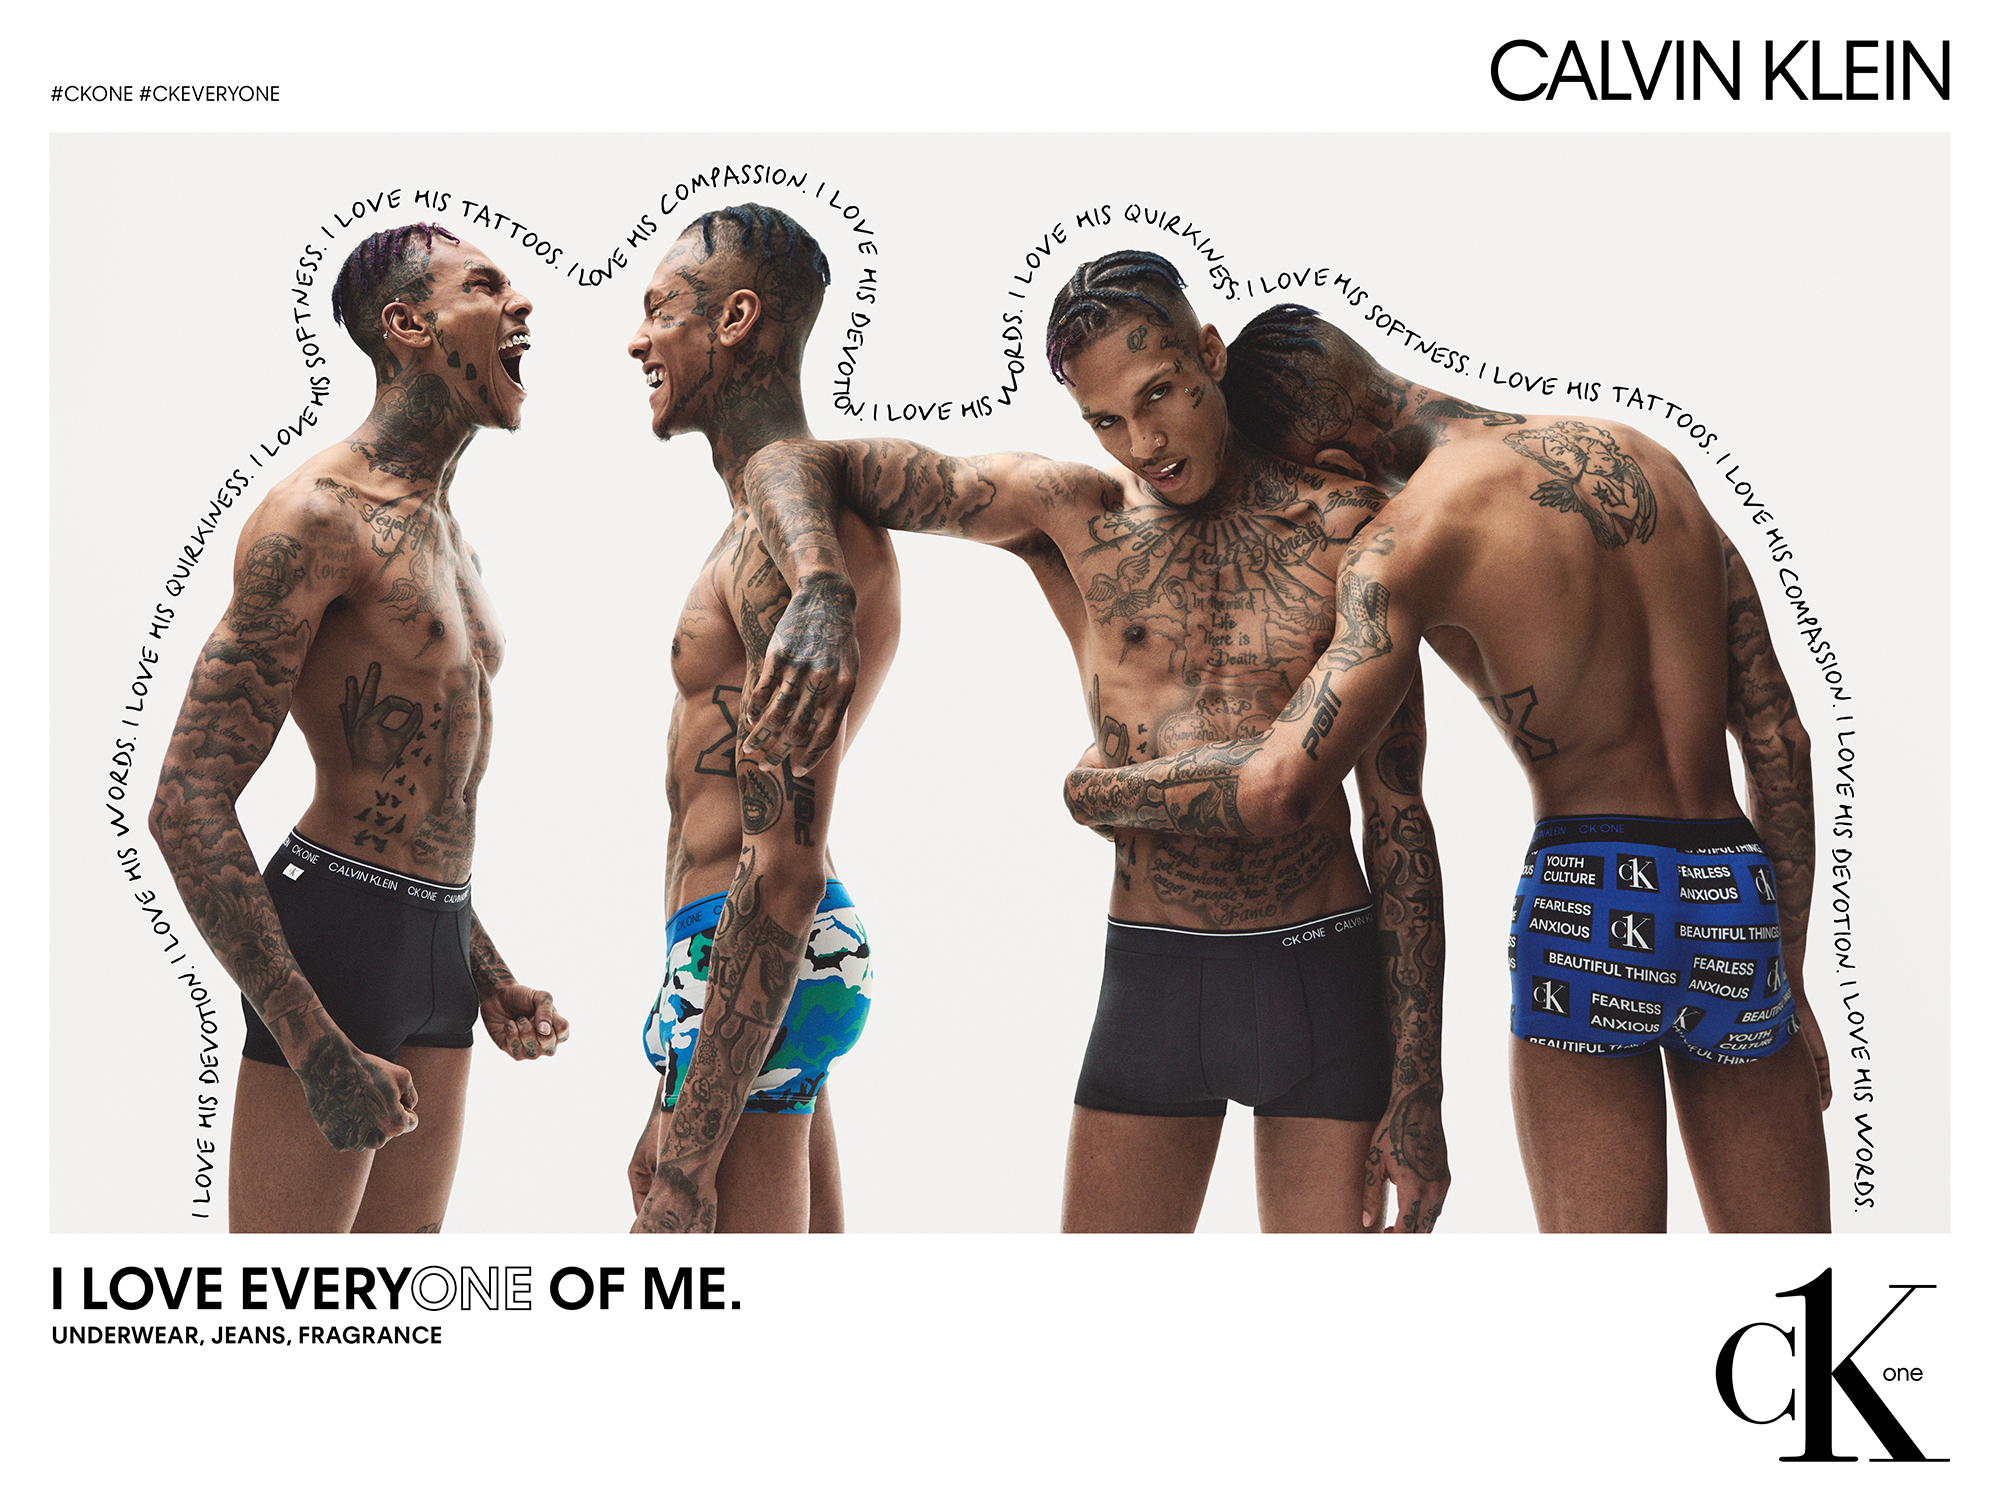 calvin klein ckone ckeveryone 2